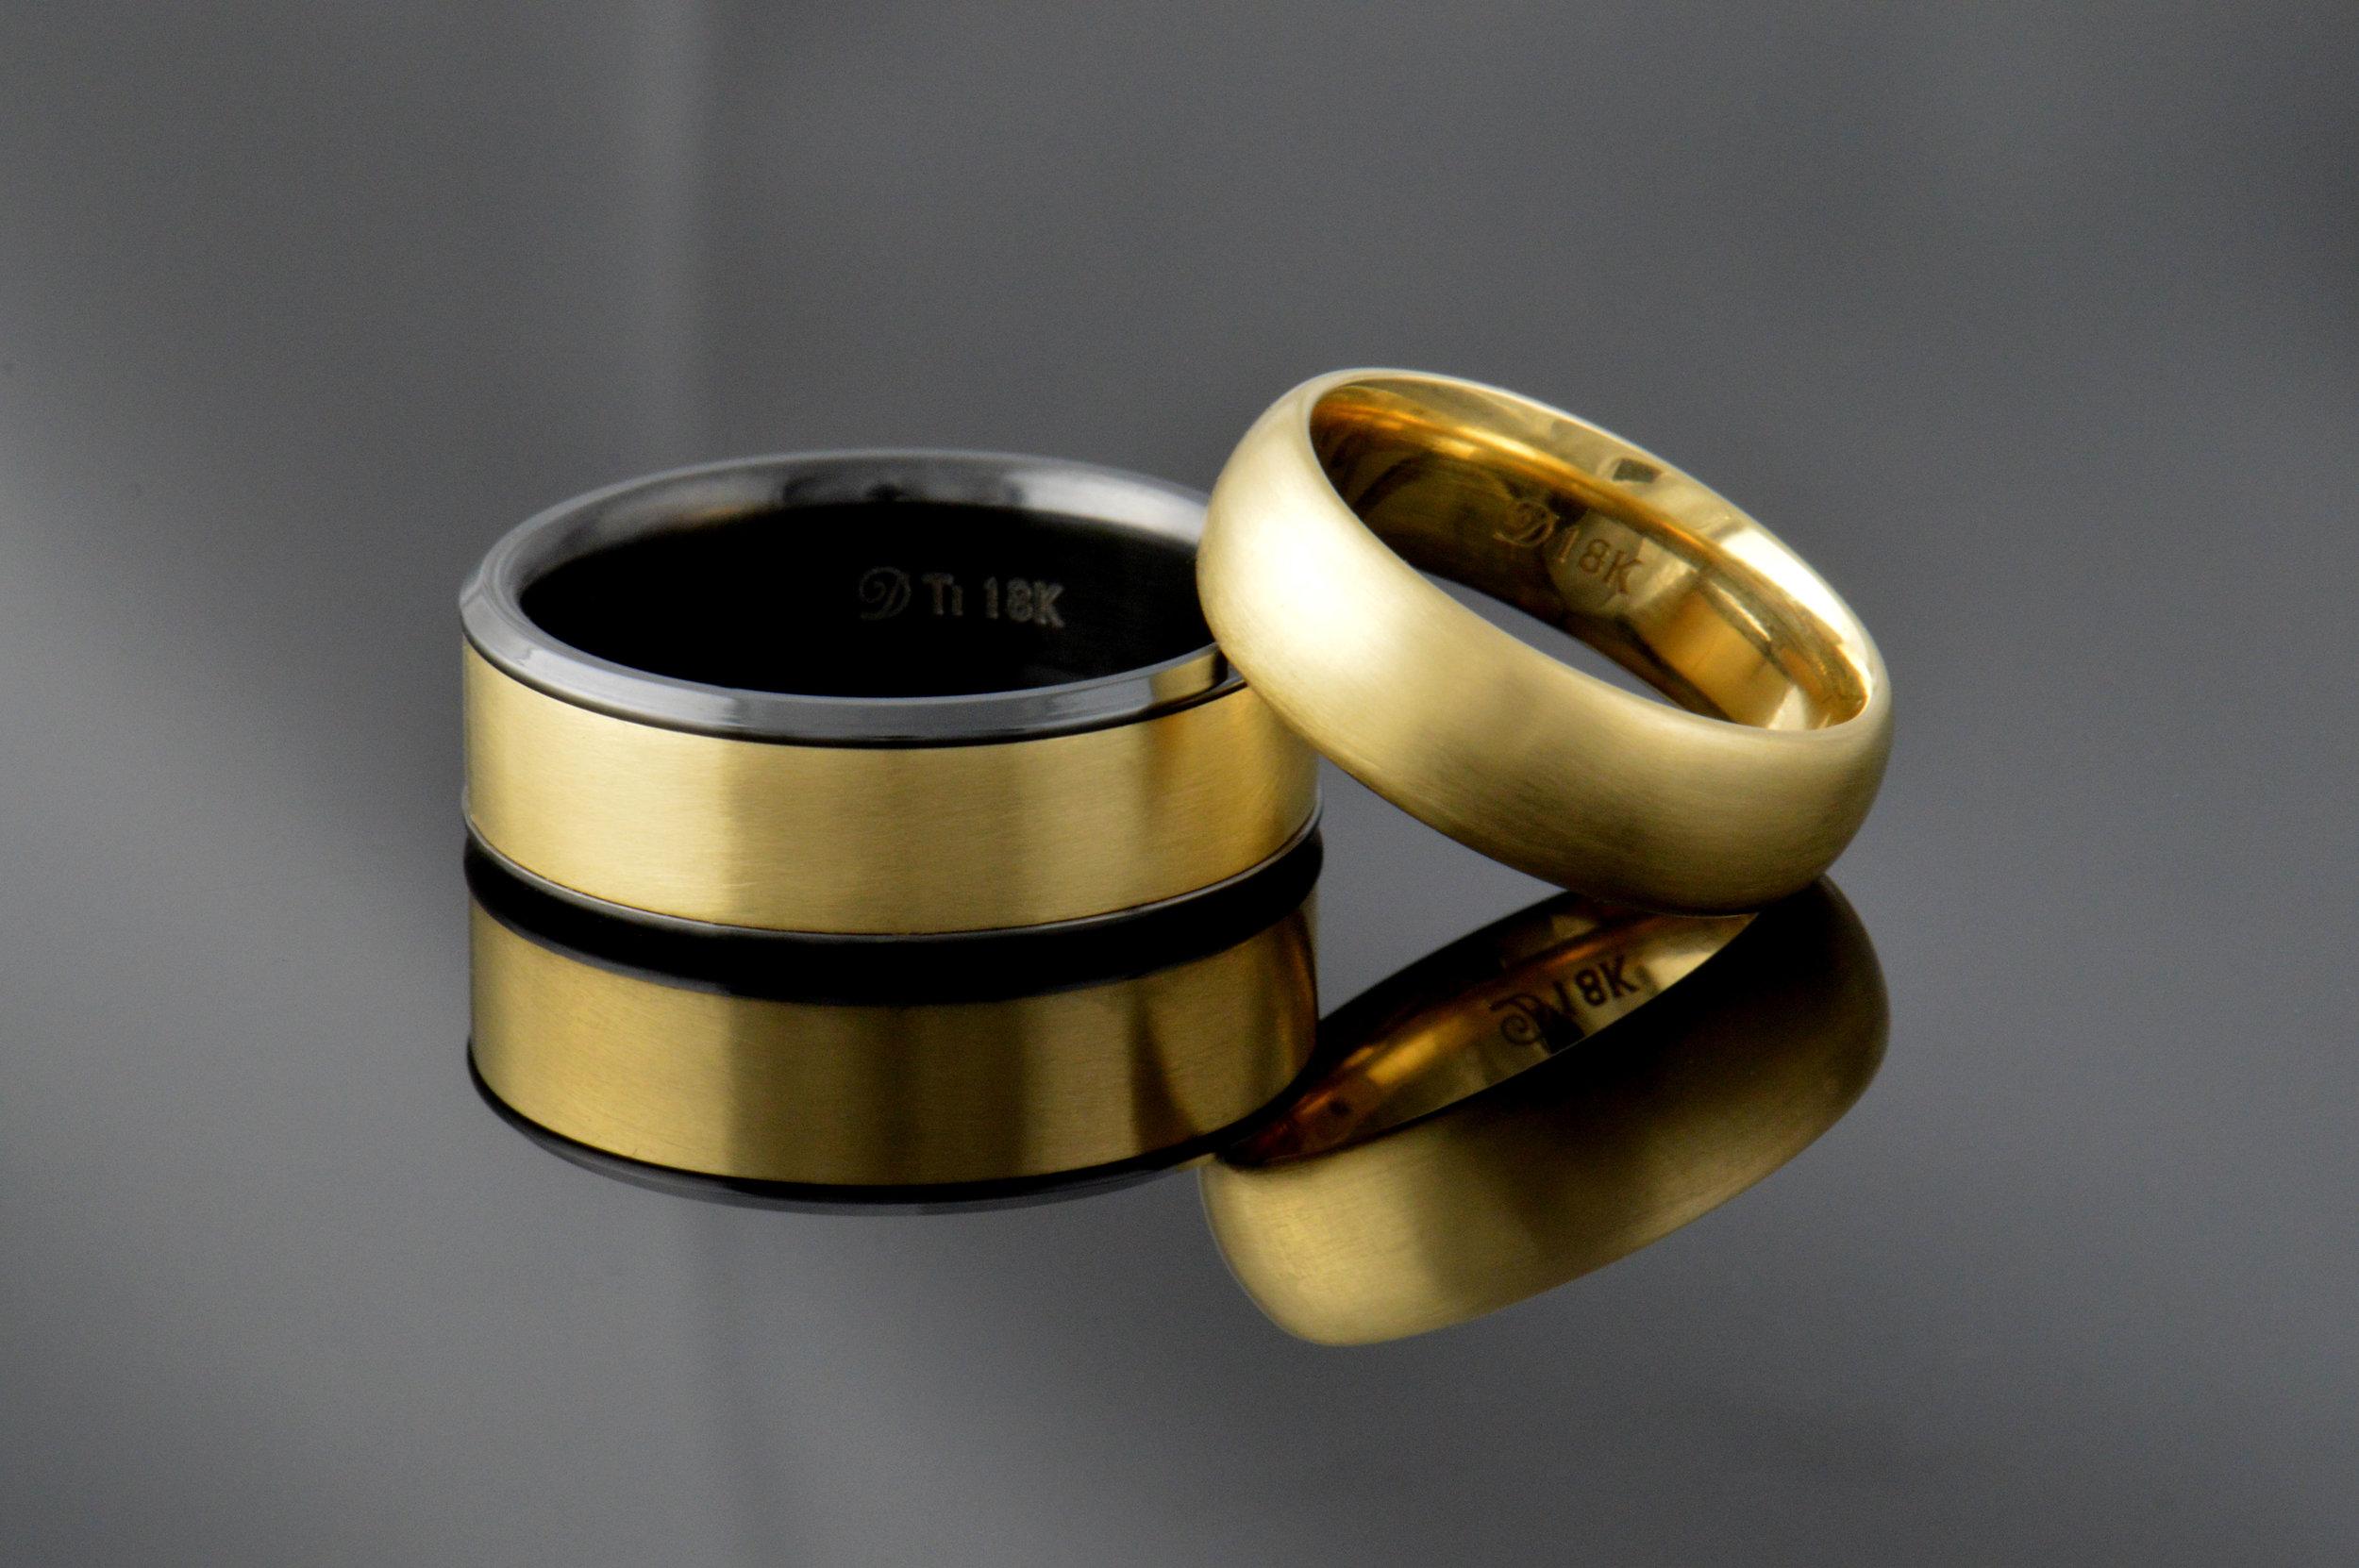 darvier-18k-recycled-gold-black-titanium.JPG